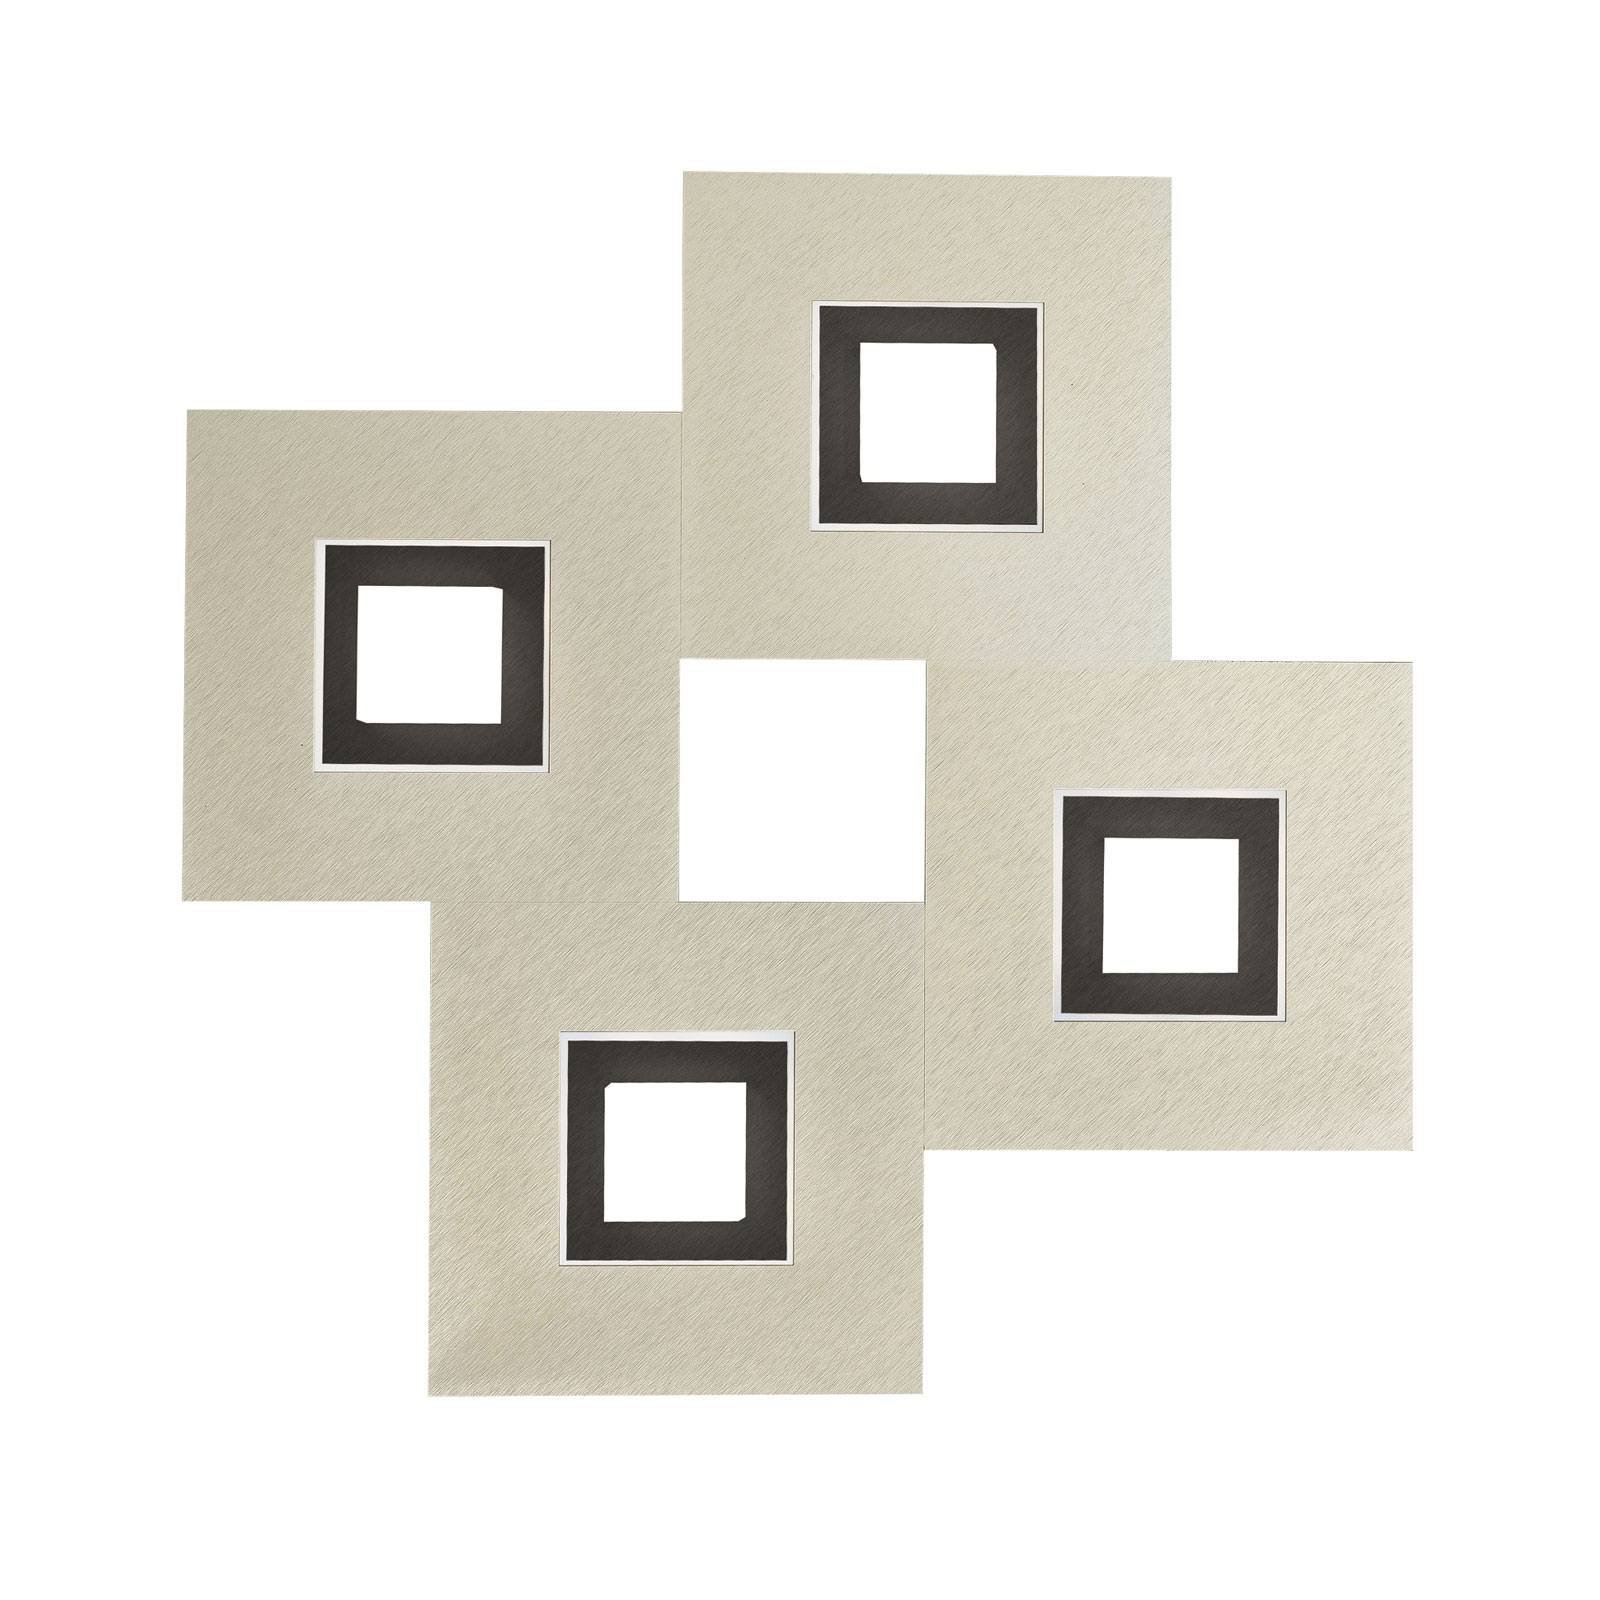 GROSSMANN Karree. 4 lysk., 50x50 perlemor, svart